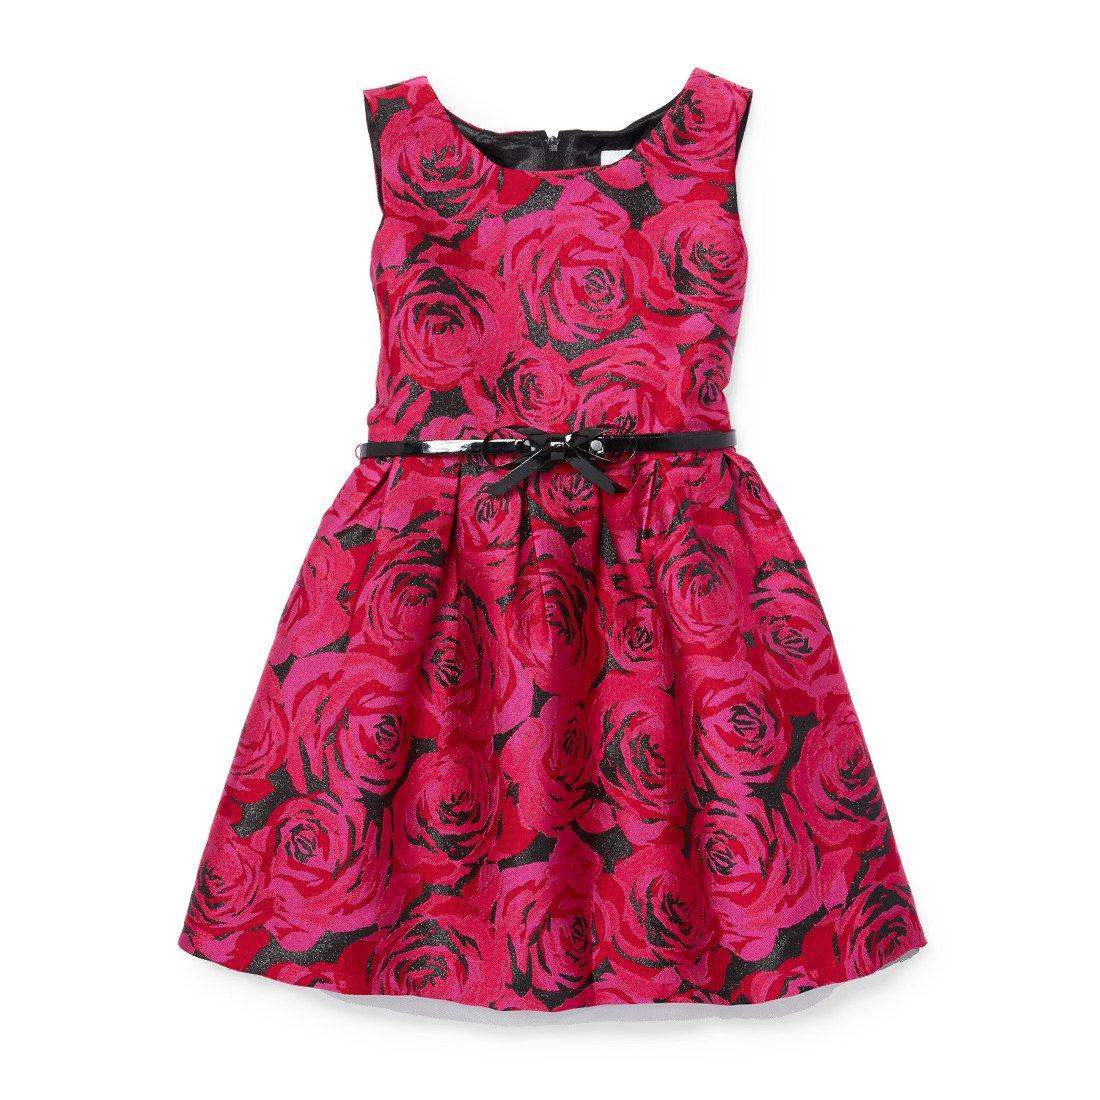 70faa97012fc Galleon - The Children's Place Little Girls' Sleeveless Dressy Dresses,  Glamorous 90609, 4